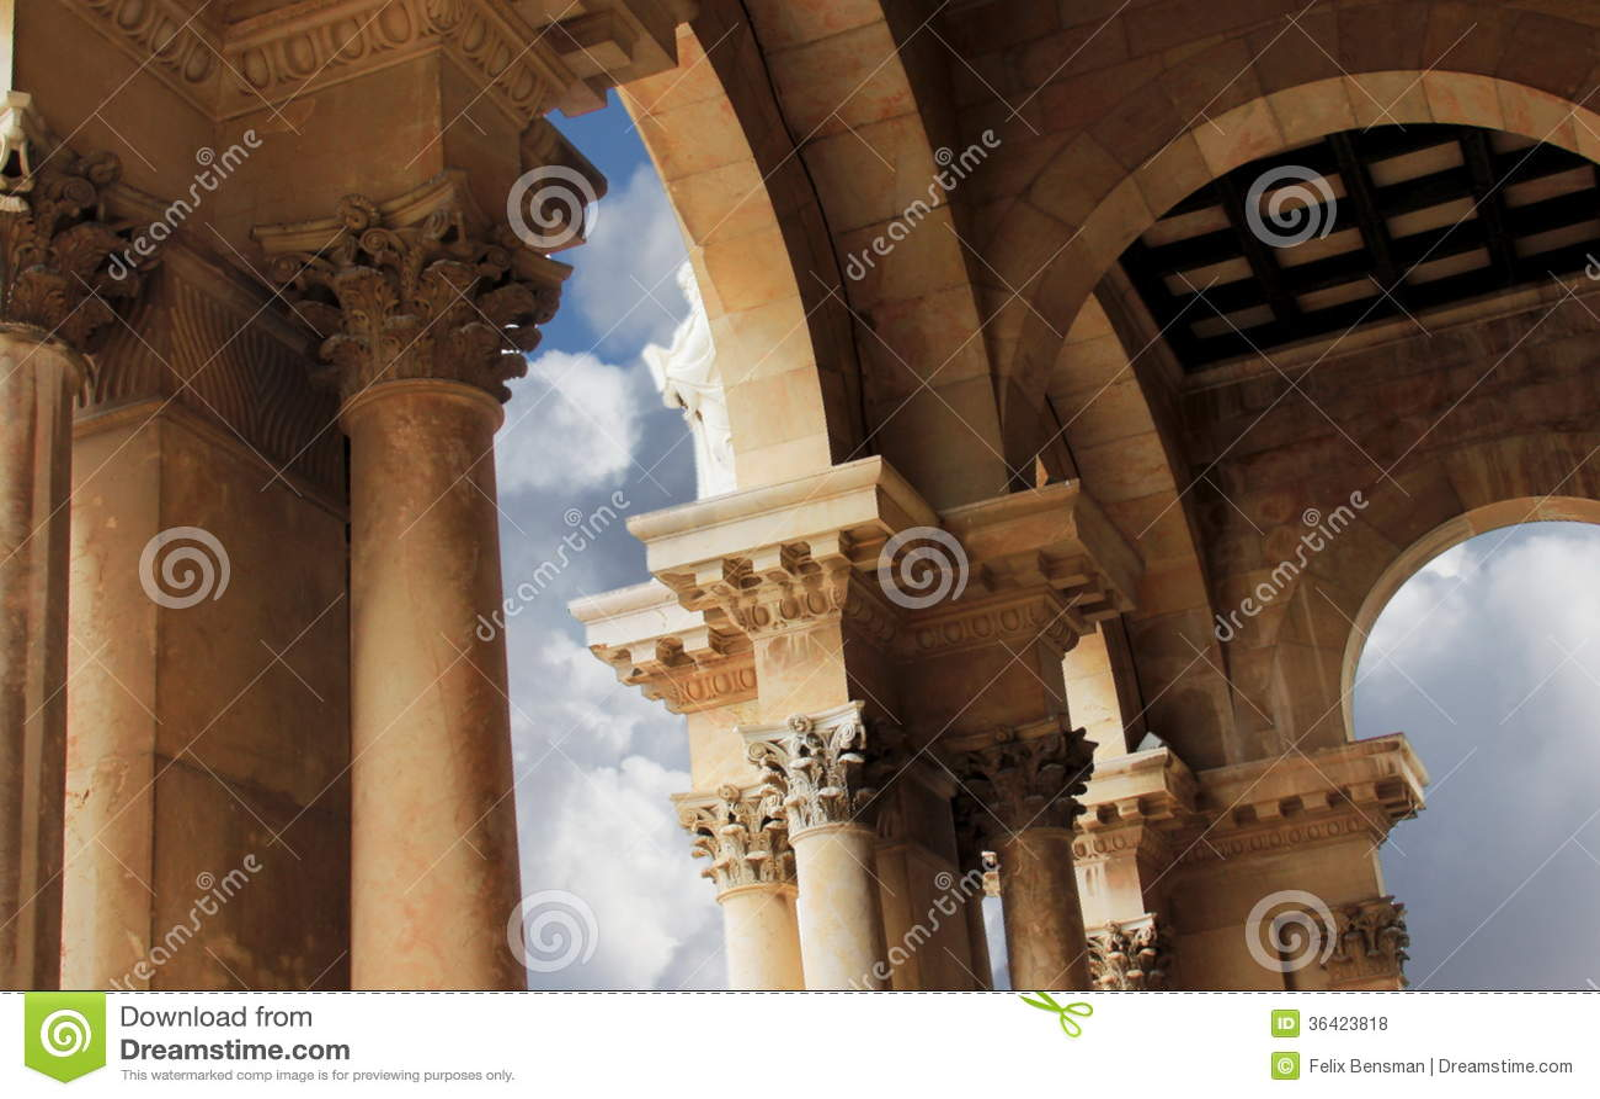 Igreja de todas as nações. Jerusalém. Israel